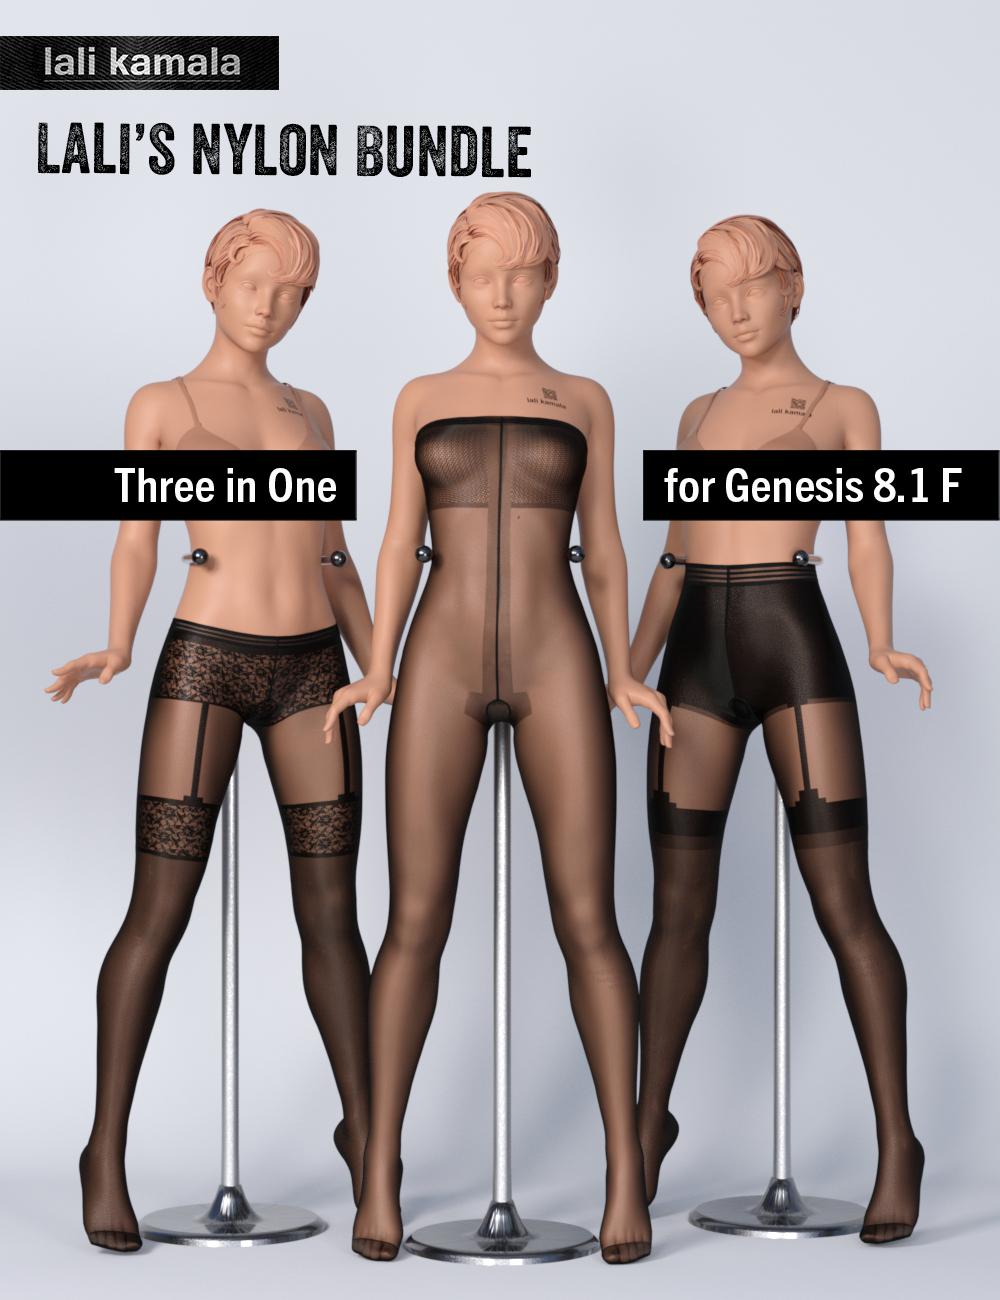 Lali's Nylon Bundle 3 in 1 by: Lali Kamala, 3D Models by Daz 3D